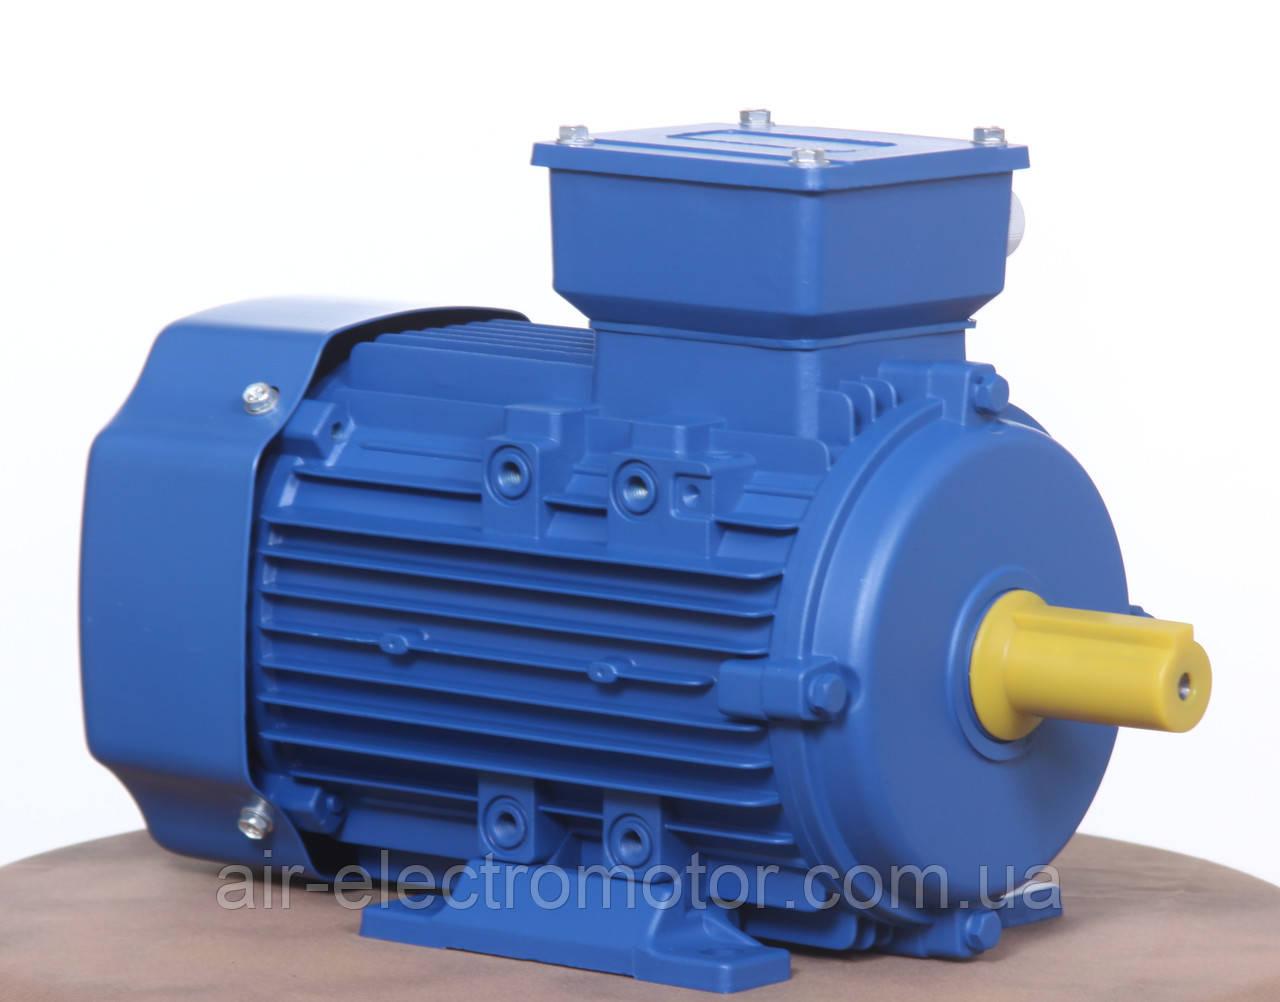 Электродвигатель АИР100L2 - 5,5кВт/ 3000 об/мин